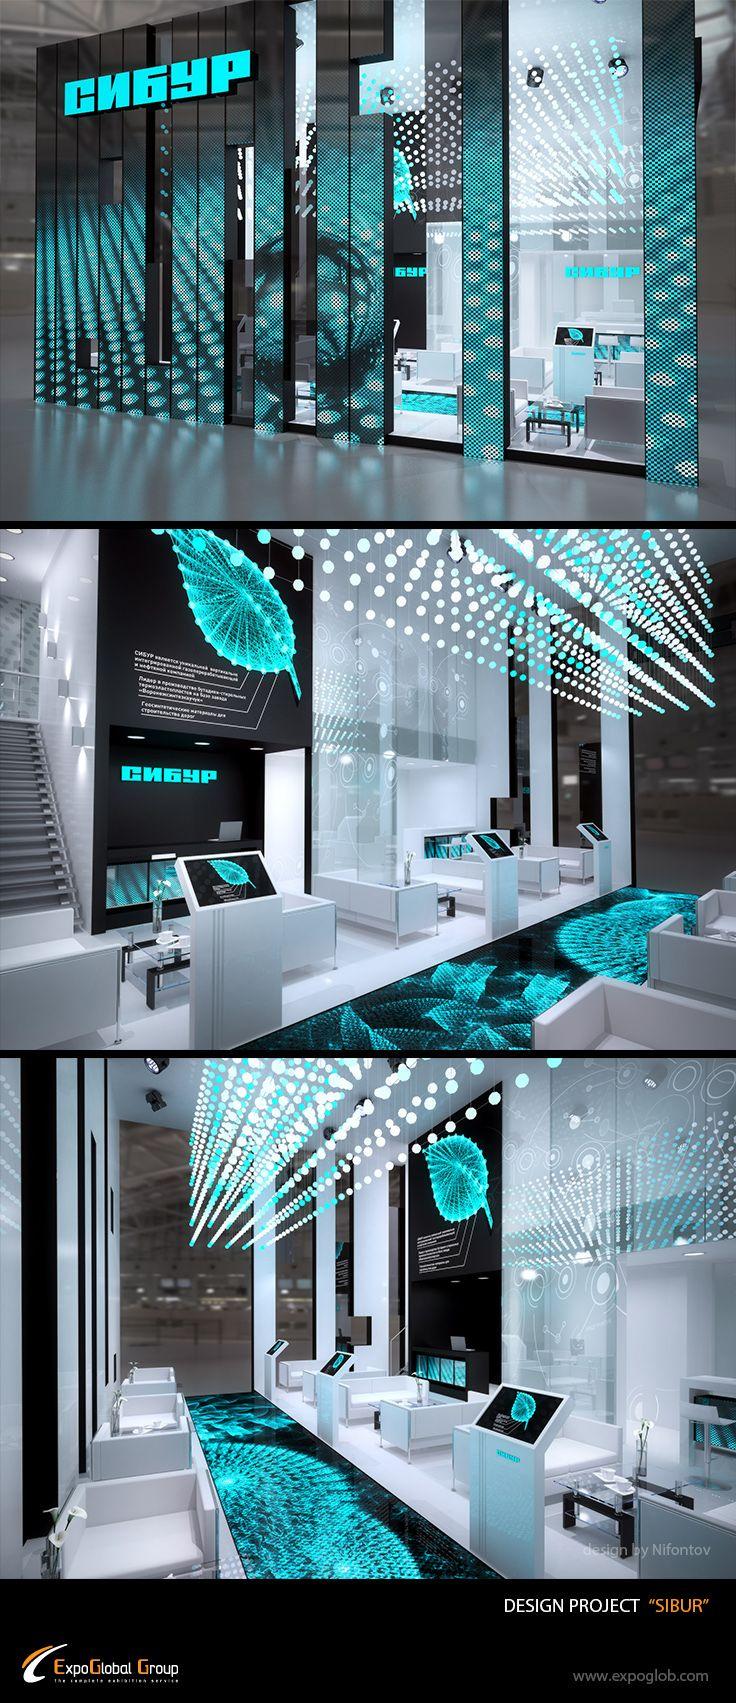 Exhibition Stand Behance : Sibur on behance architecture exhibits pinterest